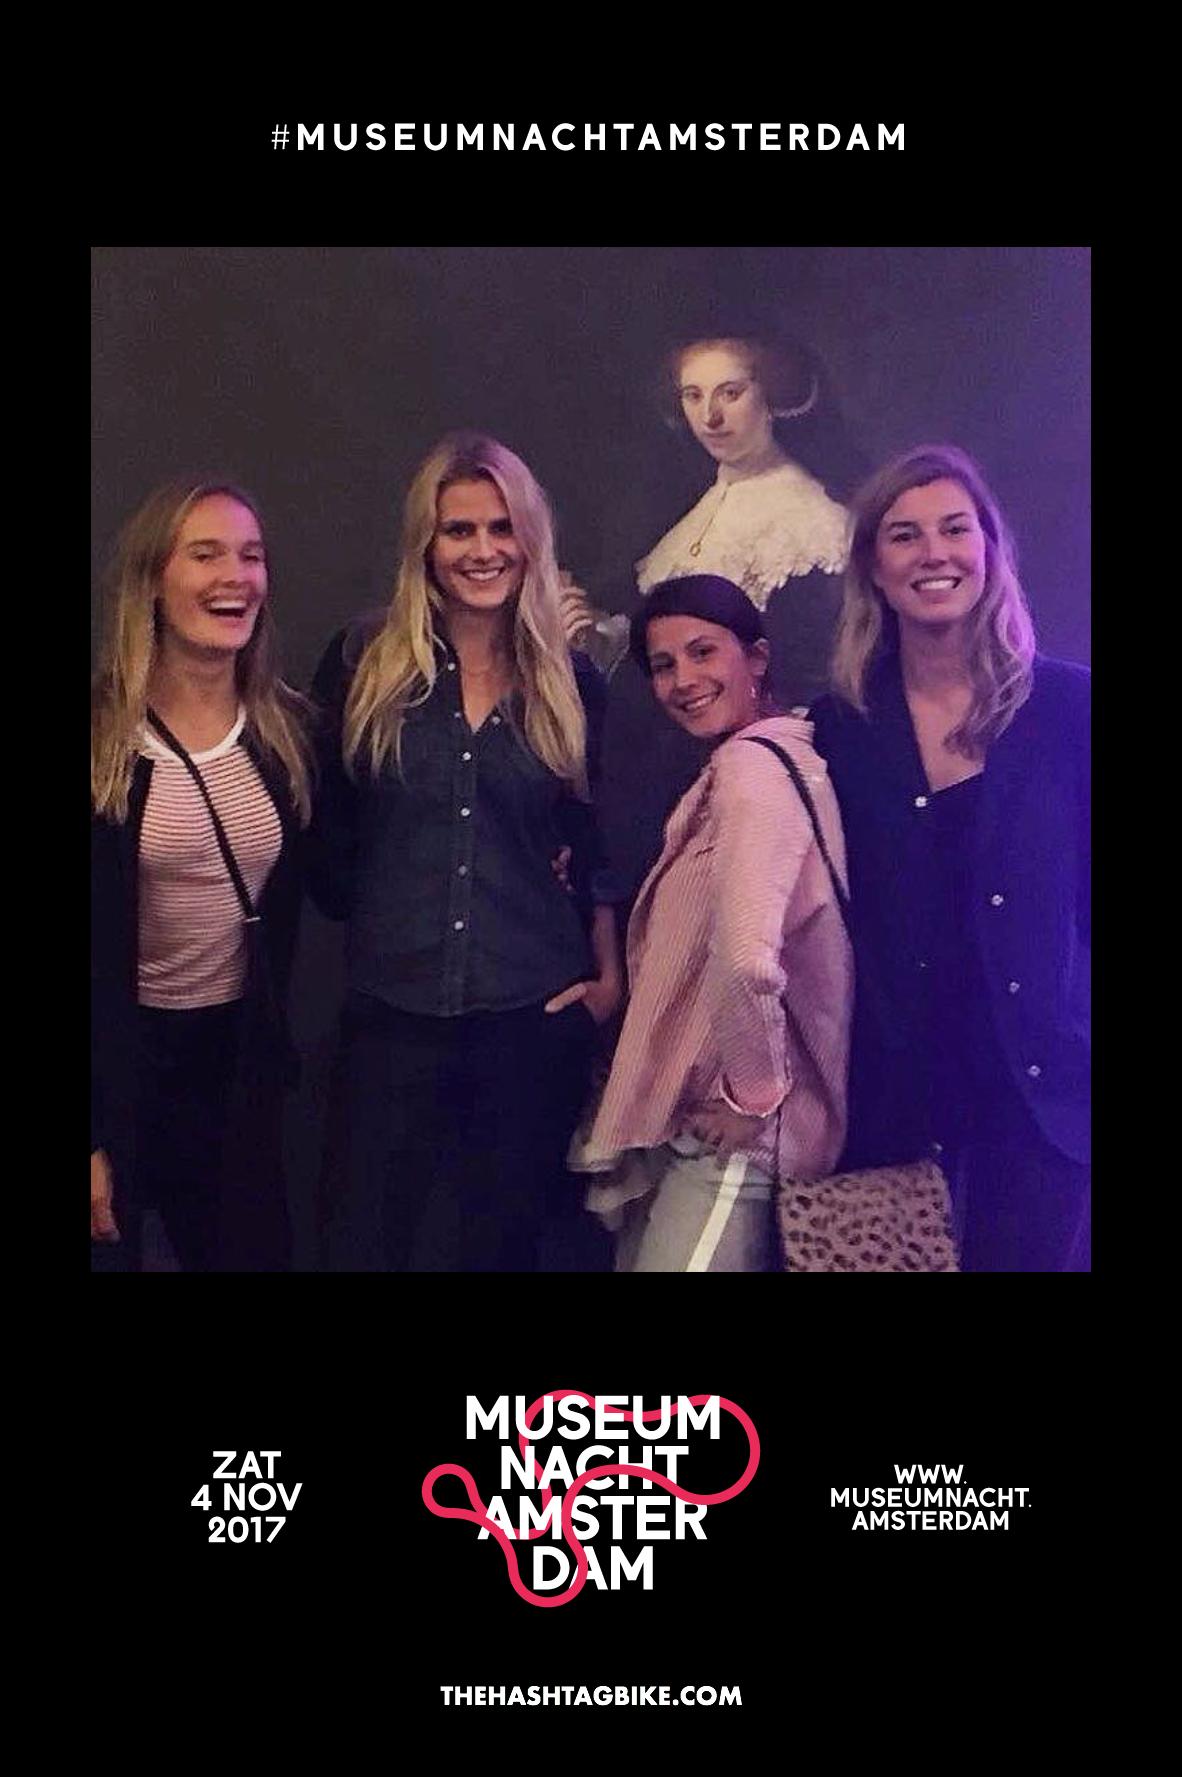 museumnacht_thehashtagbike16.png